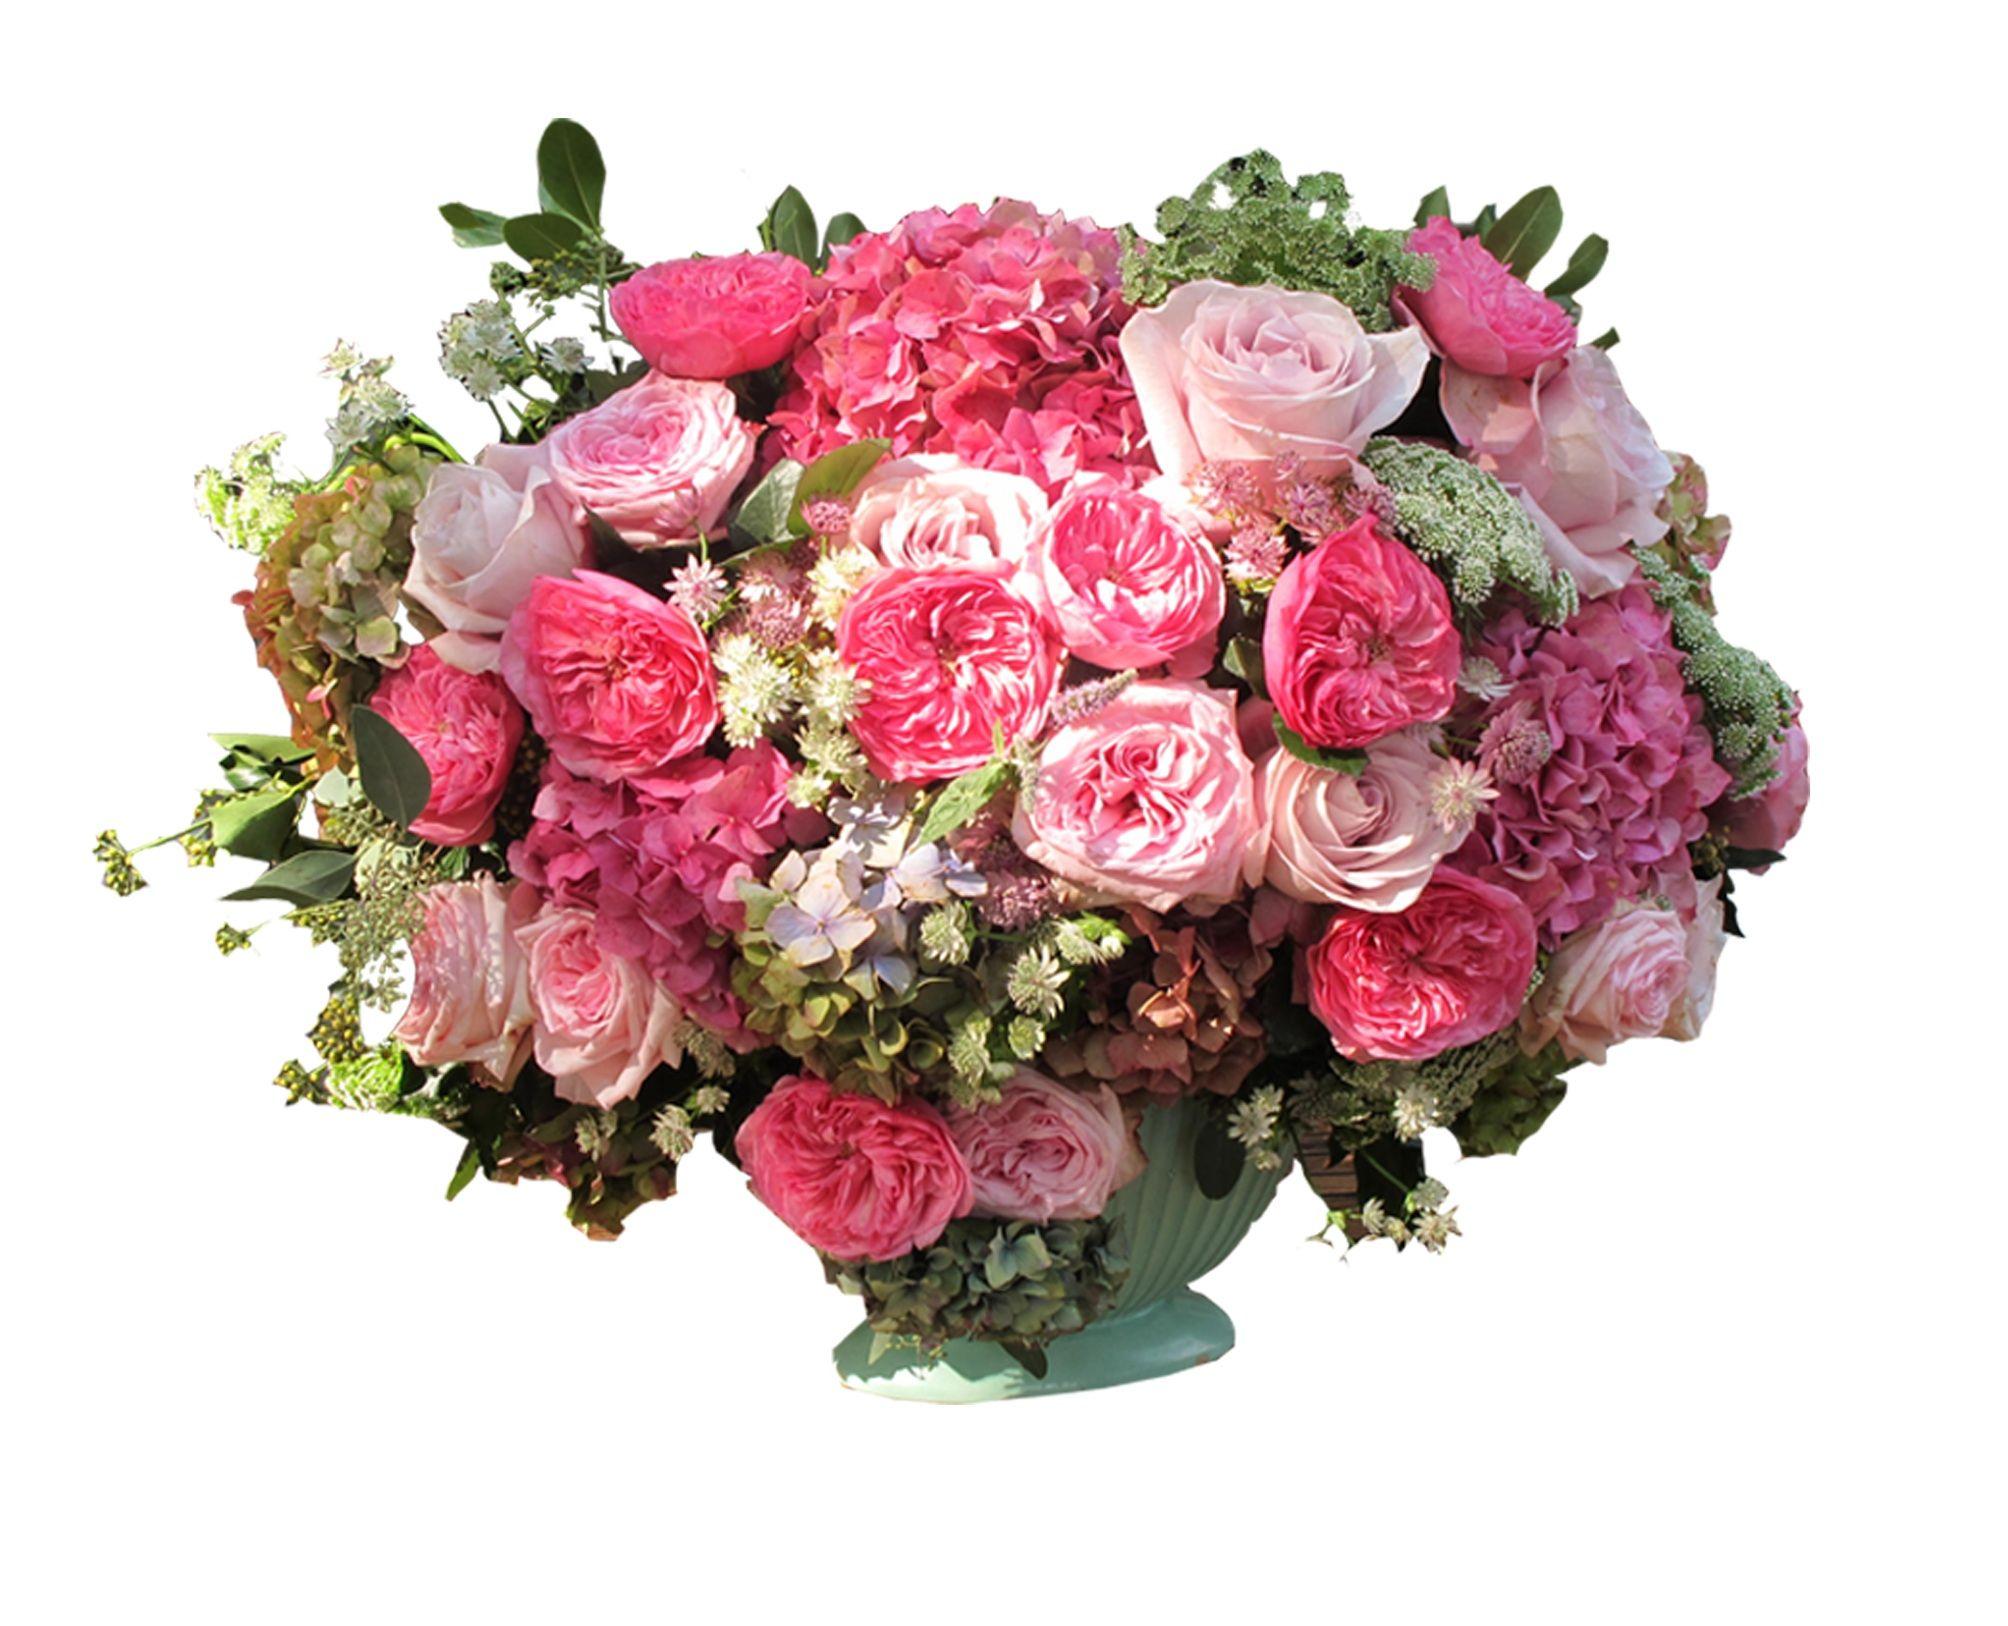 The Flower Appreciation Society Floral Arrangements Pinterest